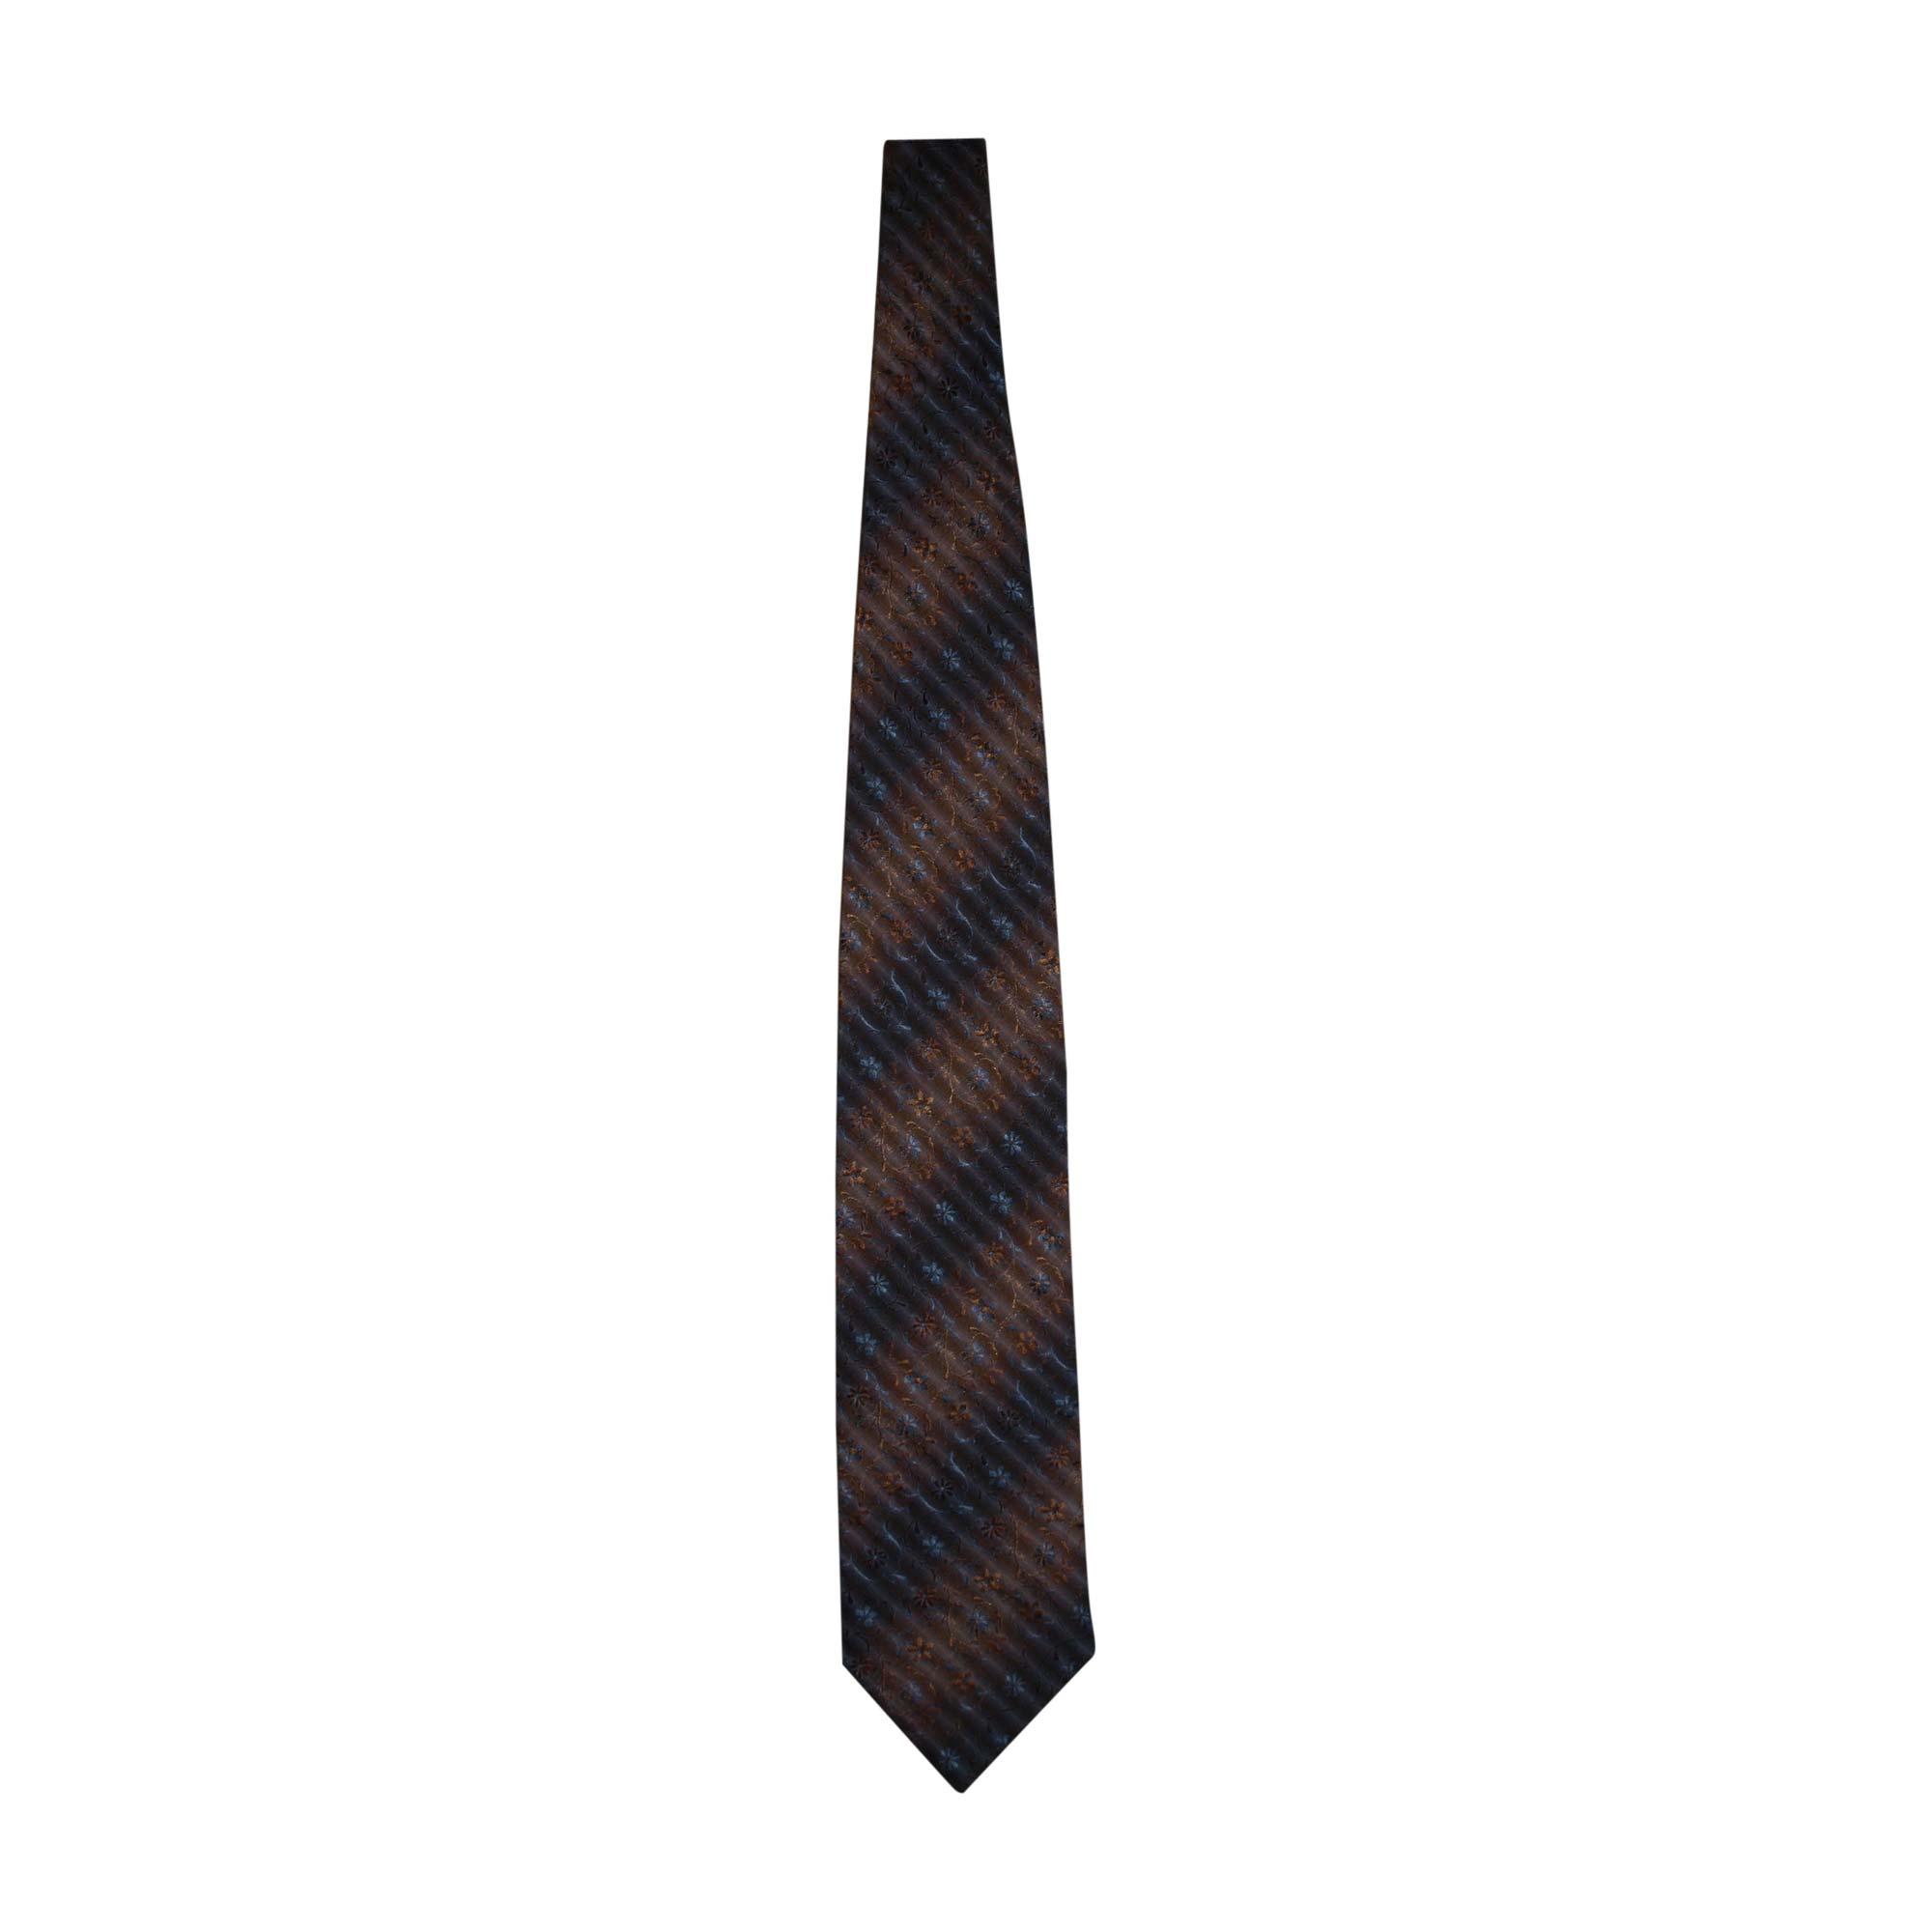 97f5b87fe572 Cravate KENZO marron - 6938633